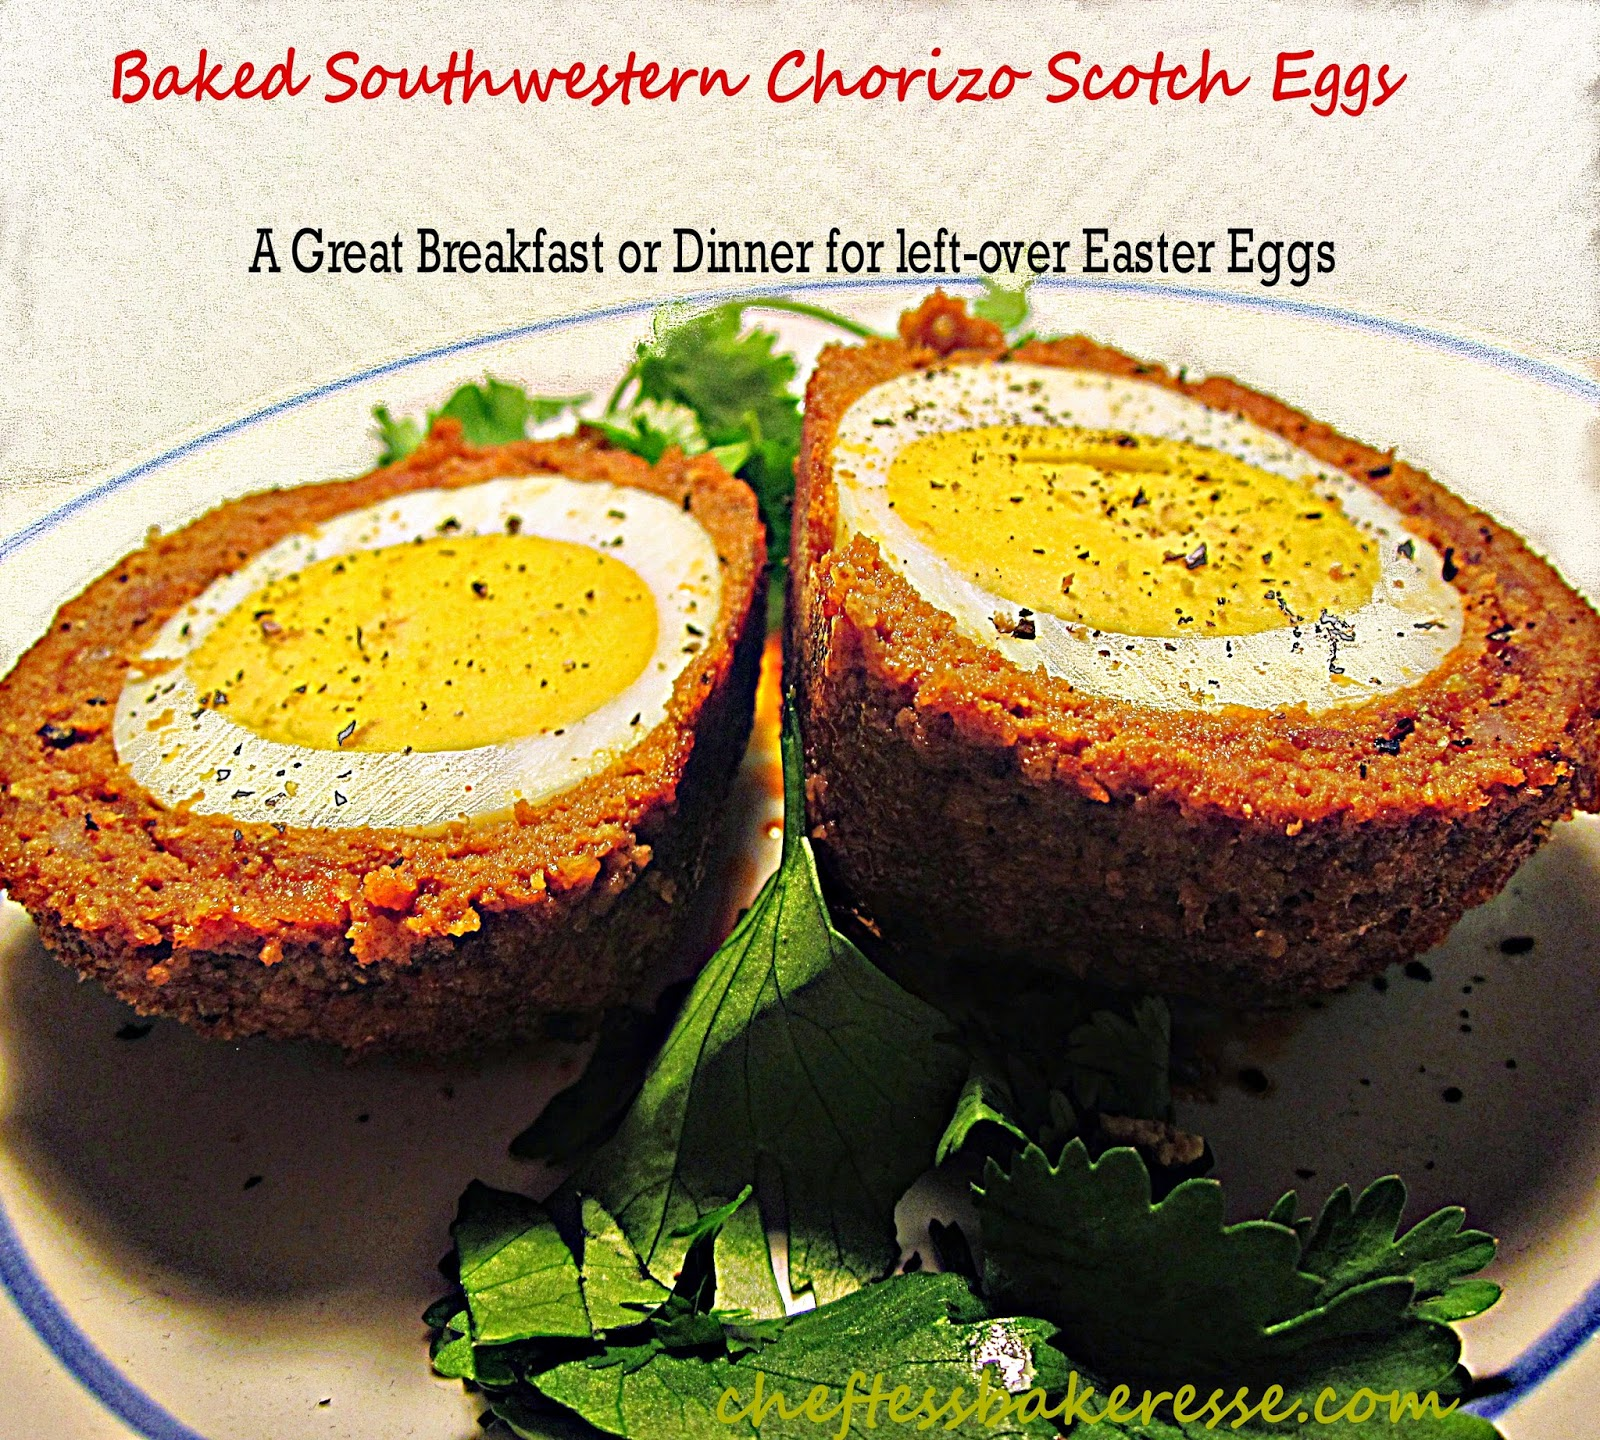 ChefTess Baked Southwestern Chorizo Scotch Eggs